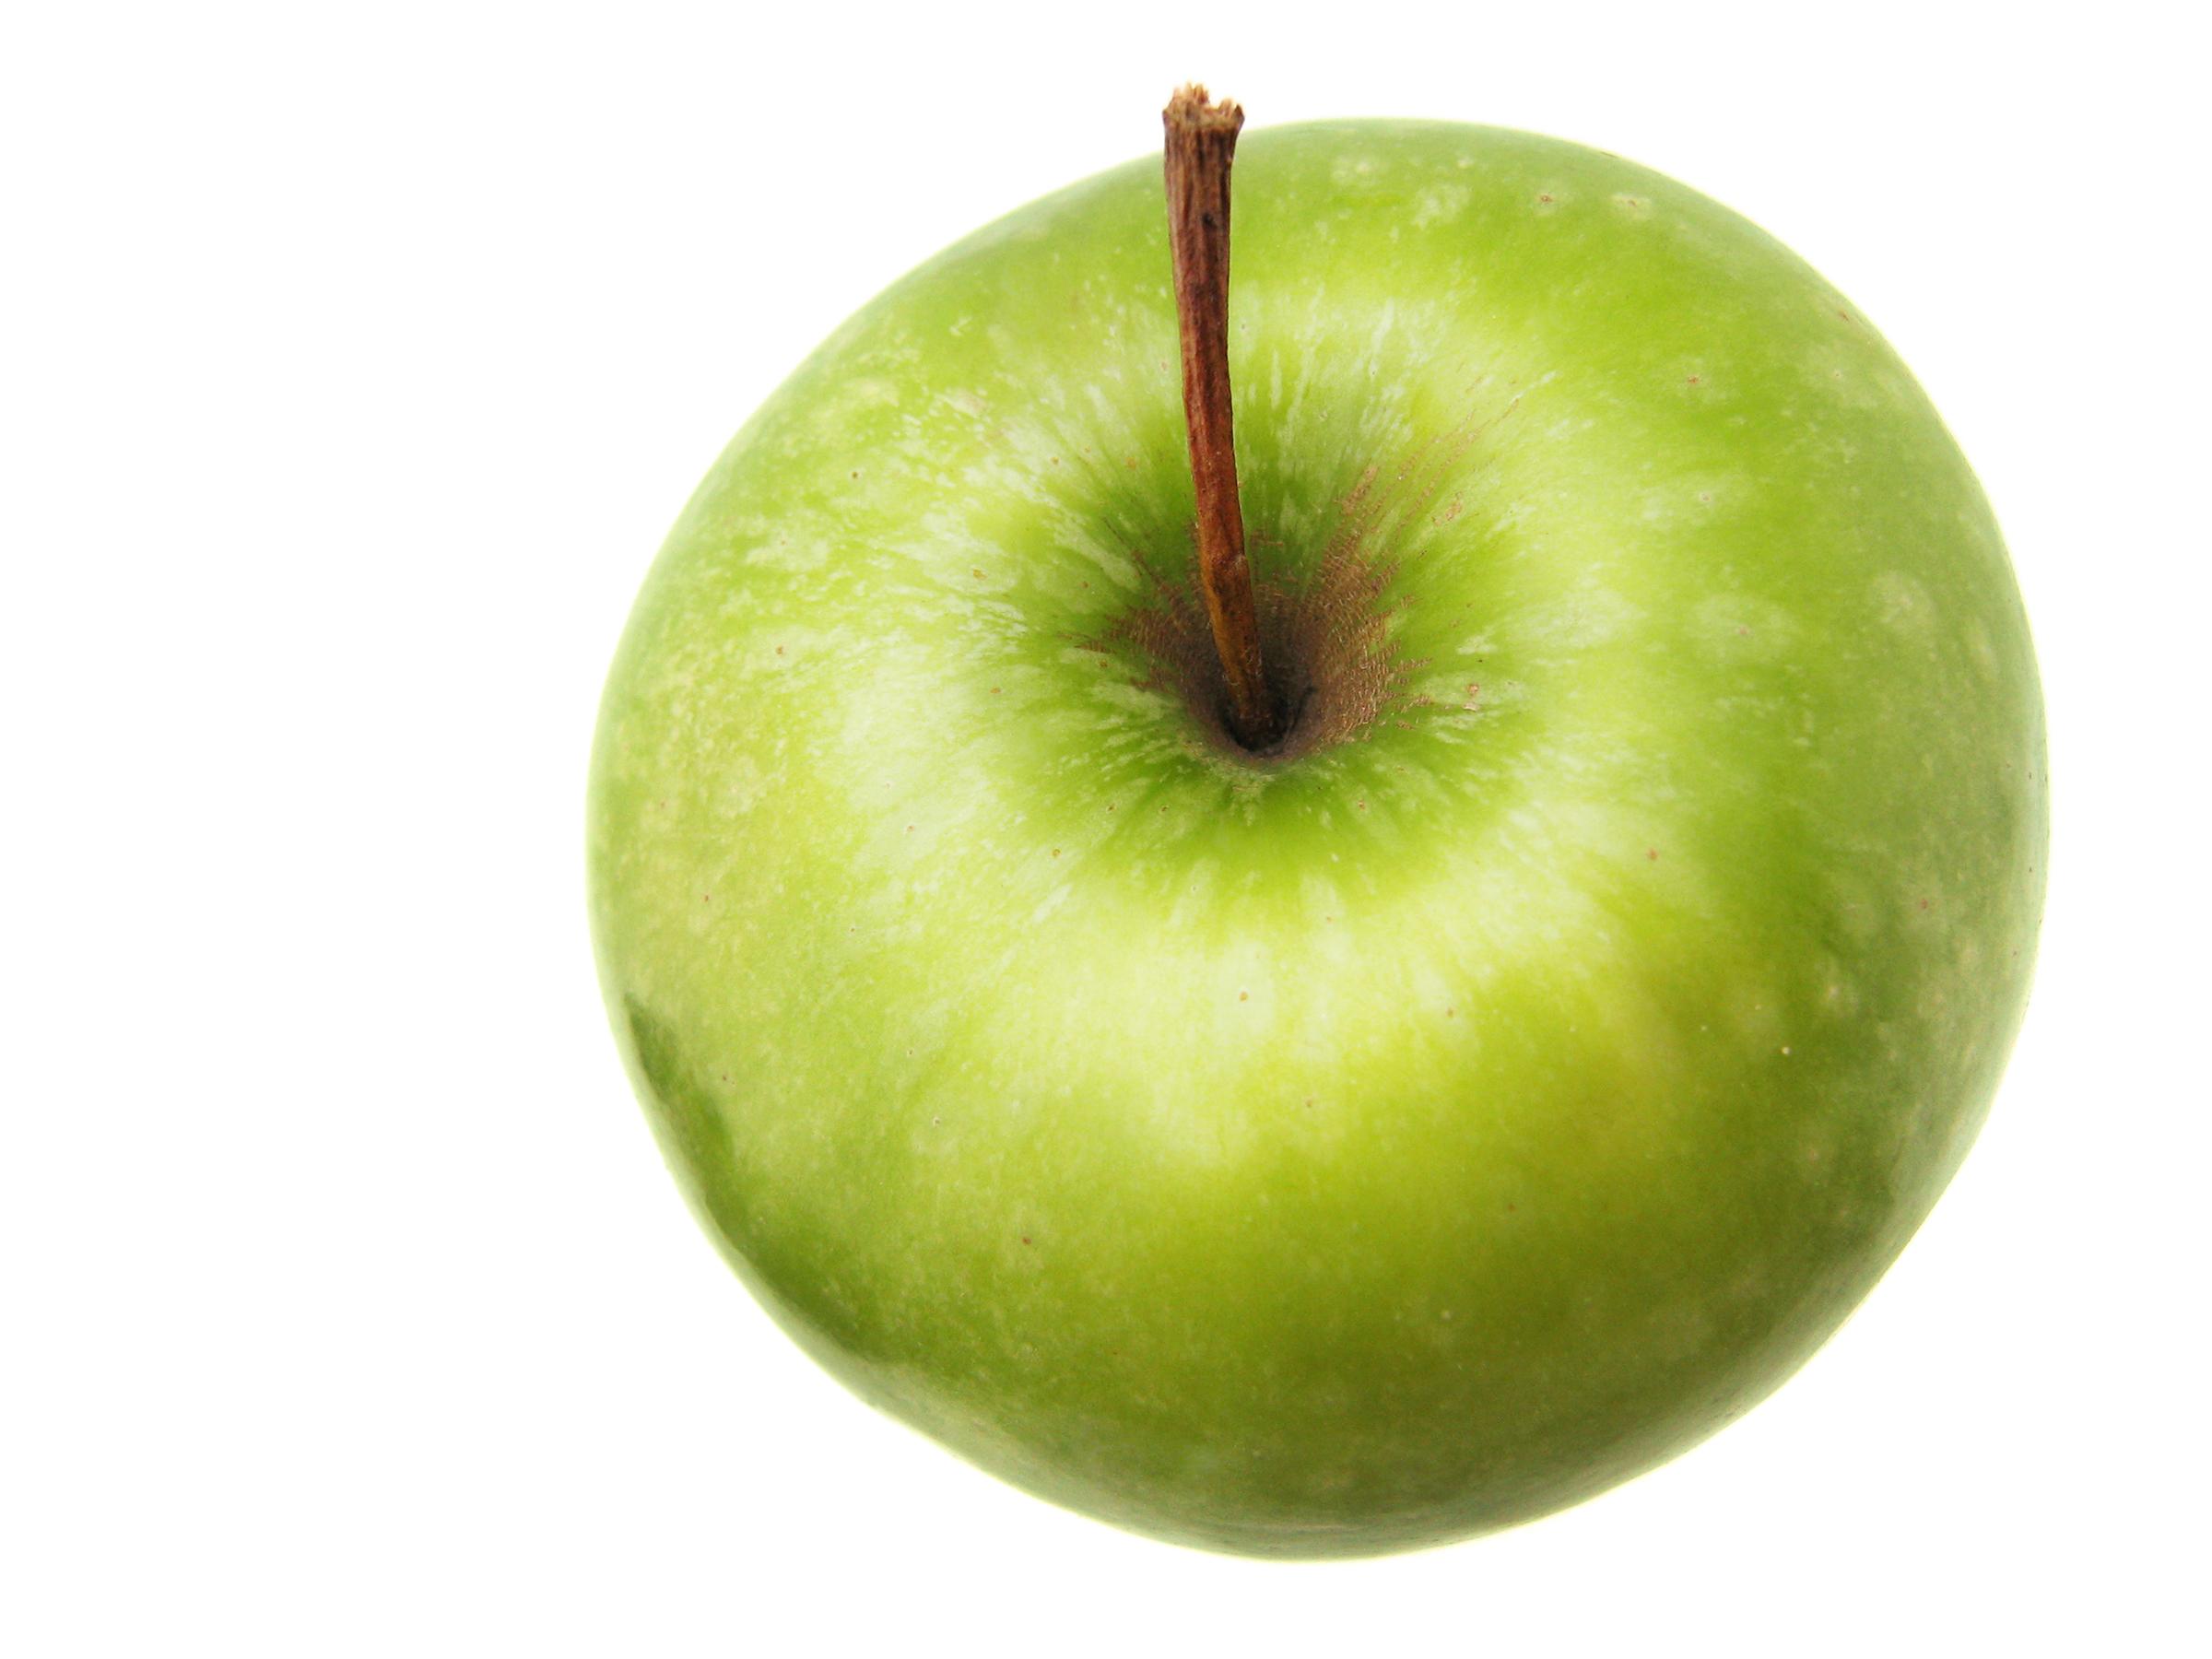 Green apple, Apple, Light, Vegetarian, Snack, HQ Photo